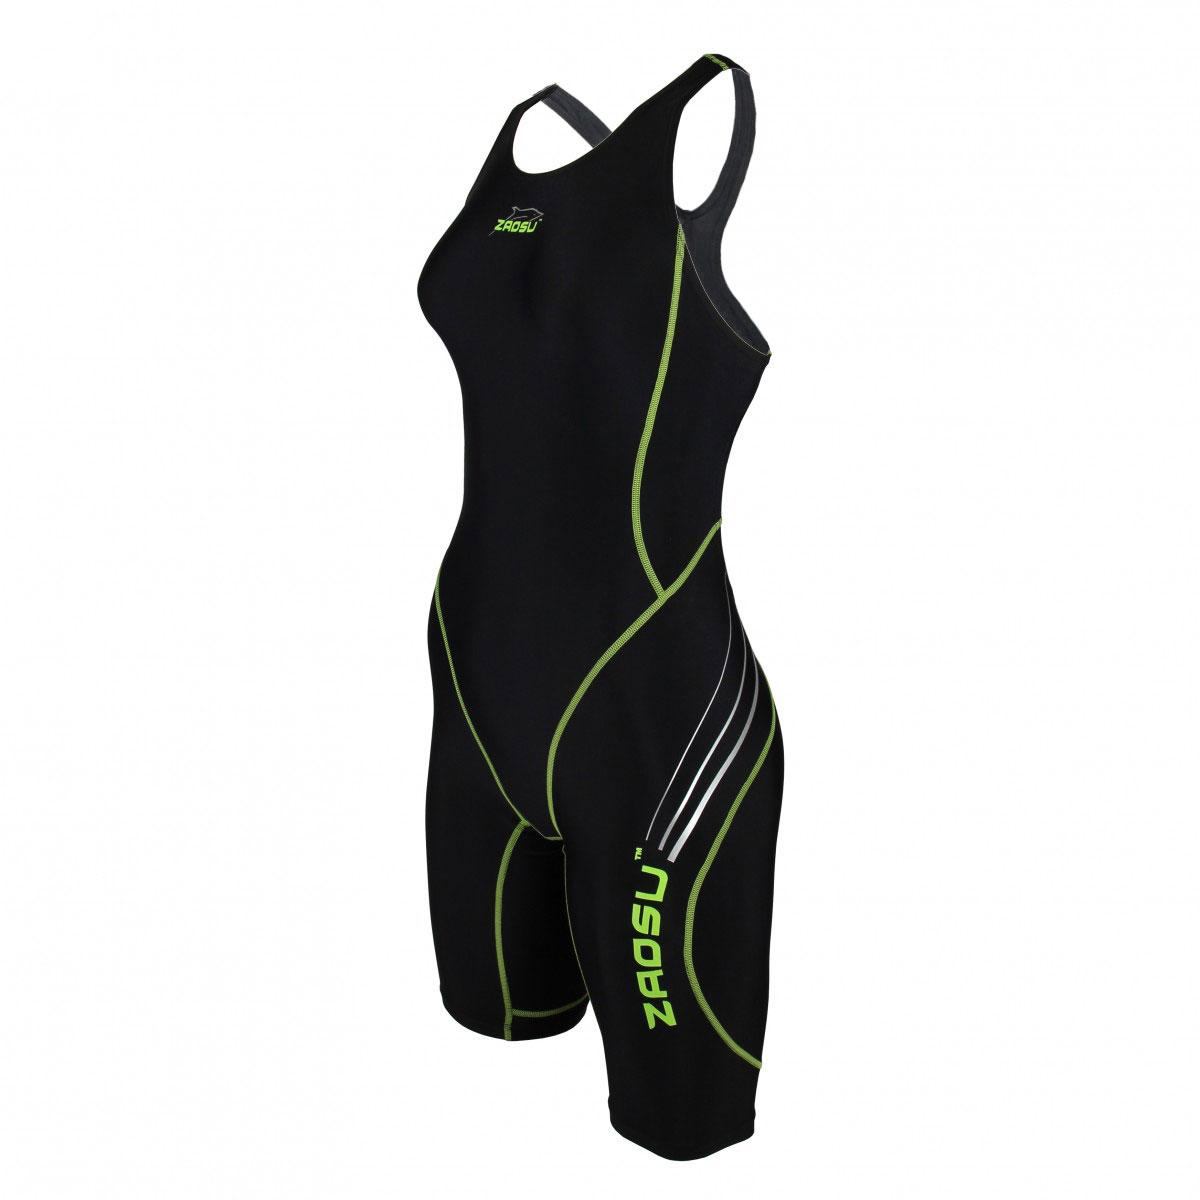 ZAOSU Wettkampf-Schwimmanzug Z-Black Badeanzug Damen Training